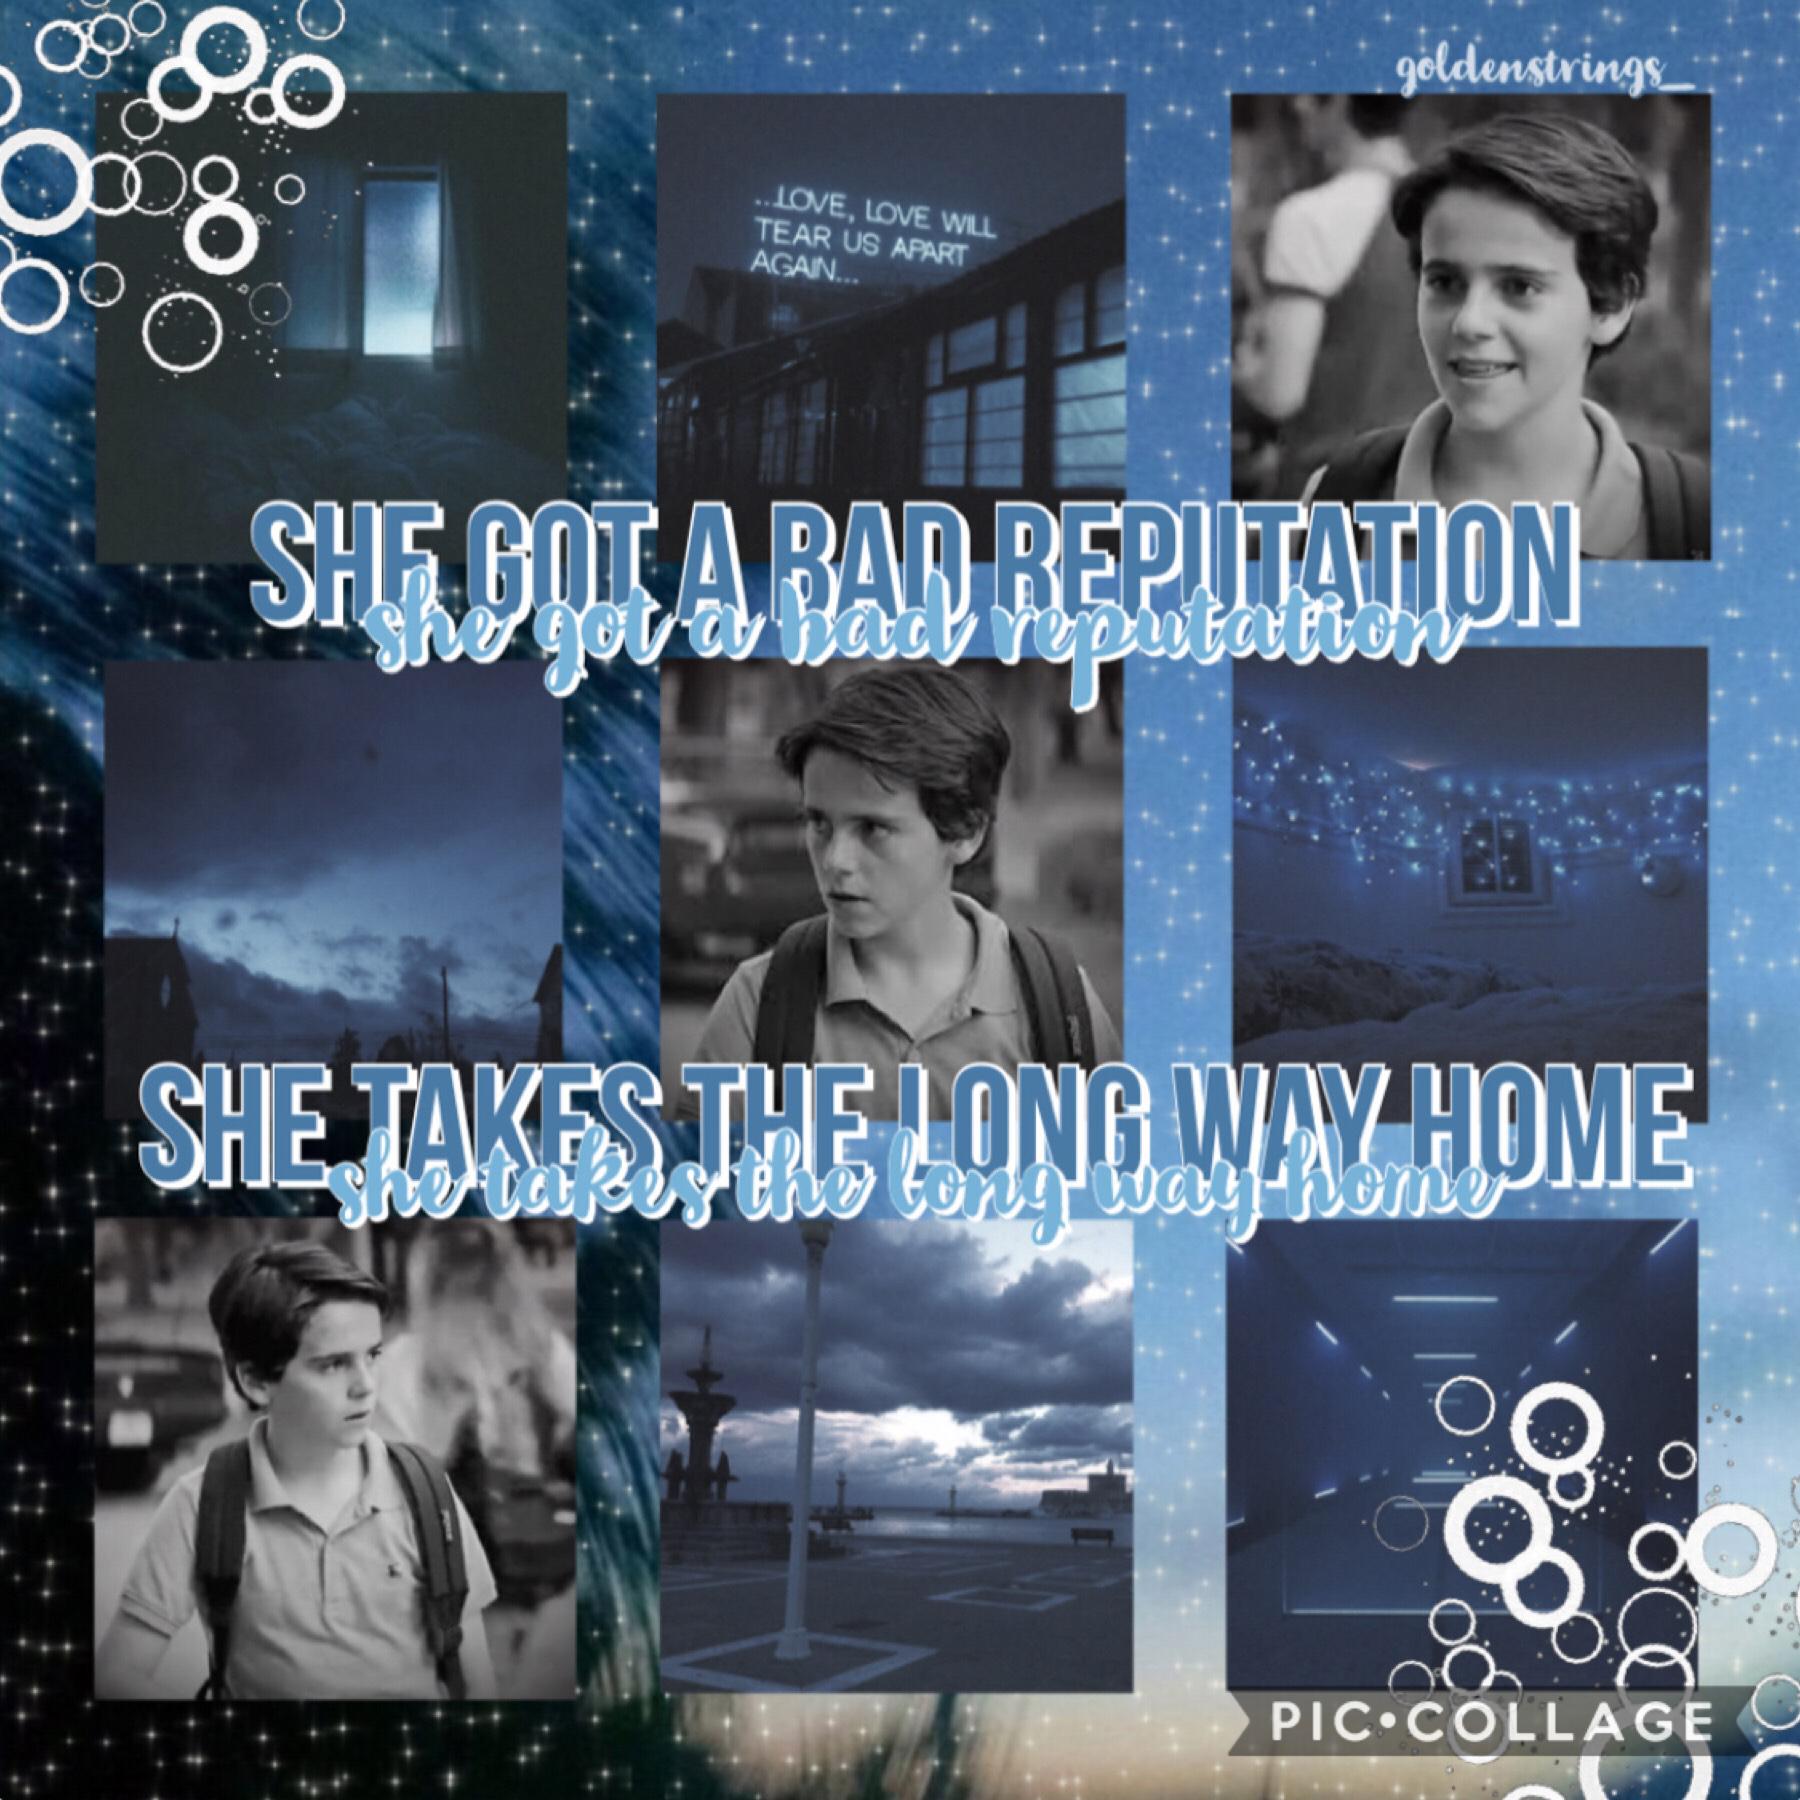 Blue Edit About Jack Dylan Grazer! 💙